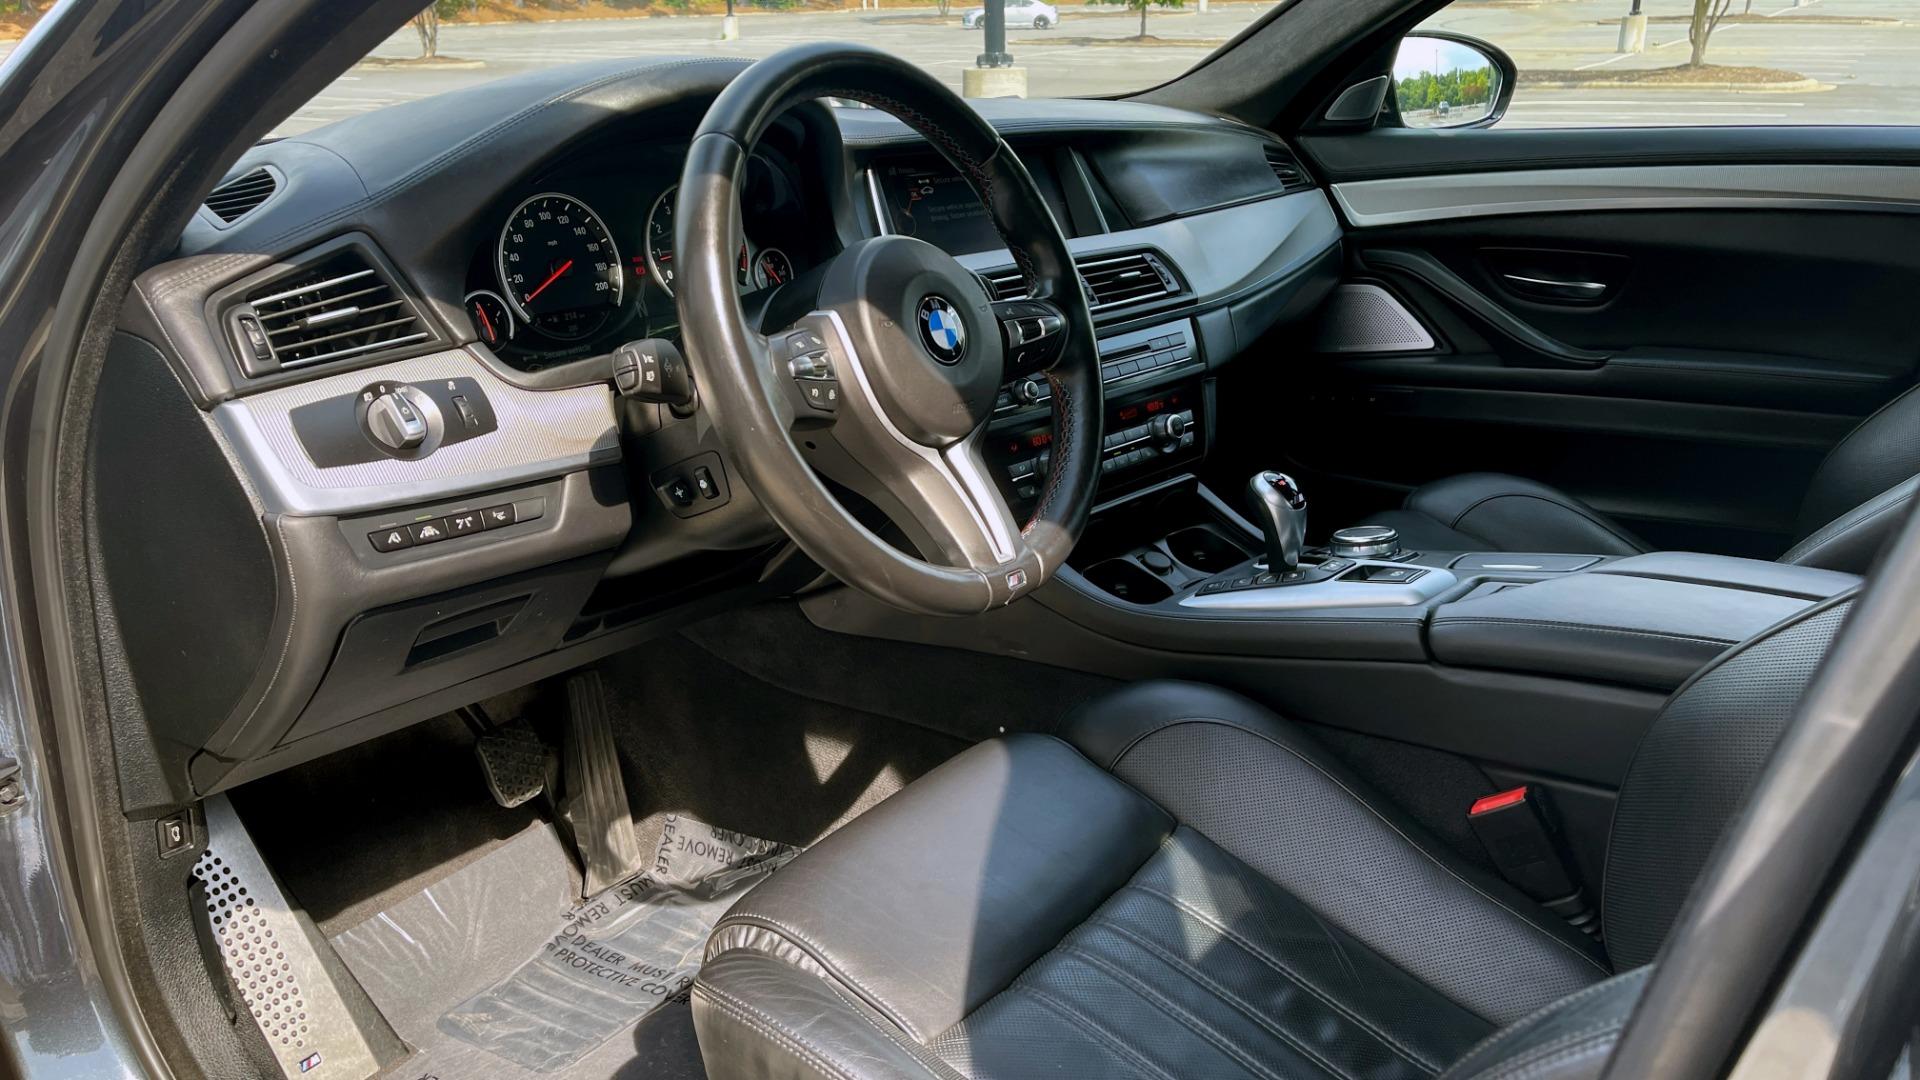 Used 2015 BMW M5 SEDAN / EXEC PKG / HUD / NAV / B&O SND / SUNROOF / REARVIEW for sale Sold at Formula Imports in Charlotte NC 28227 45